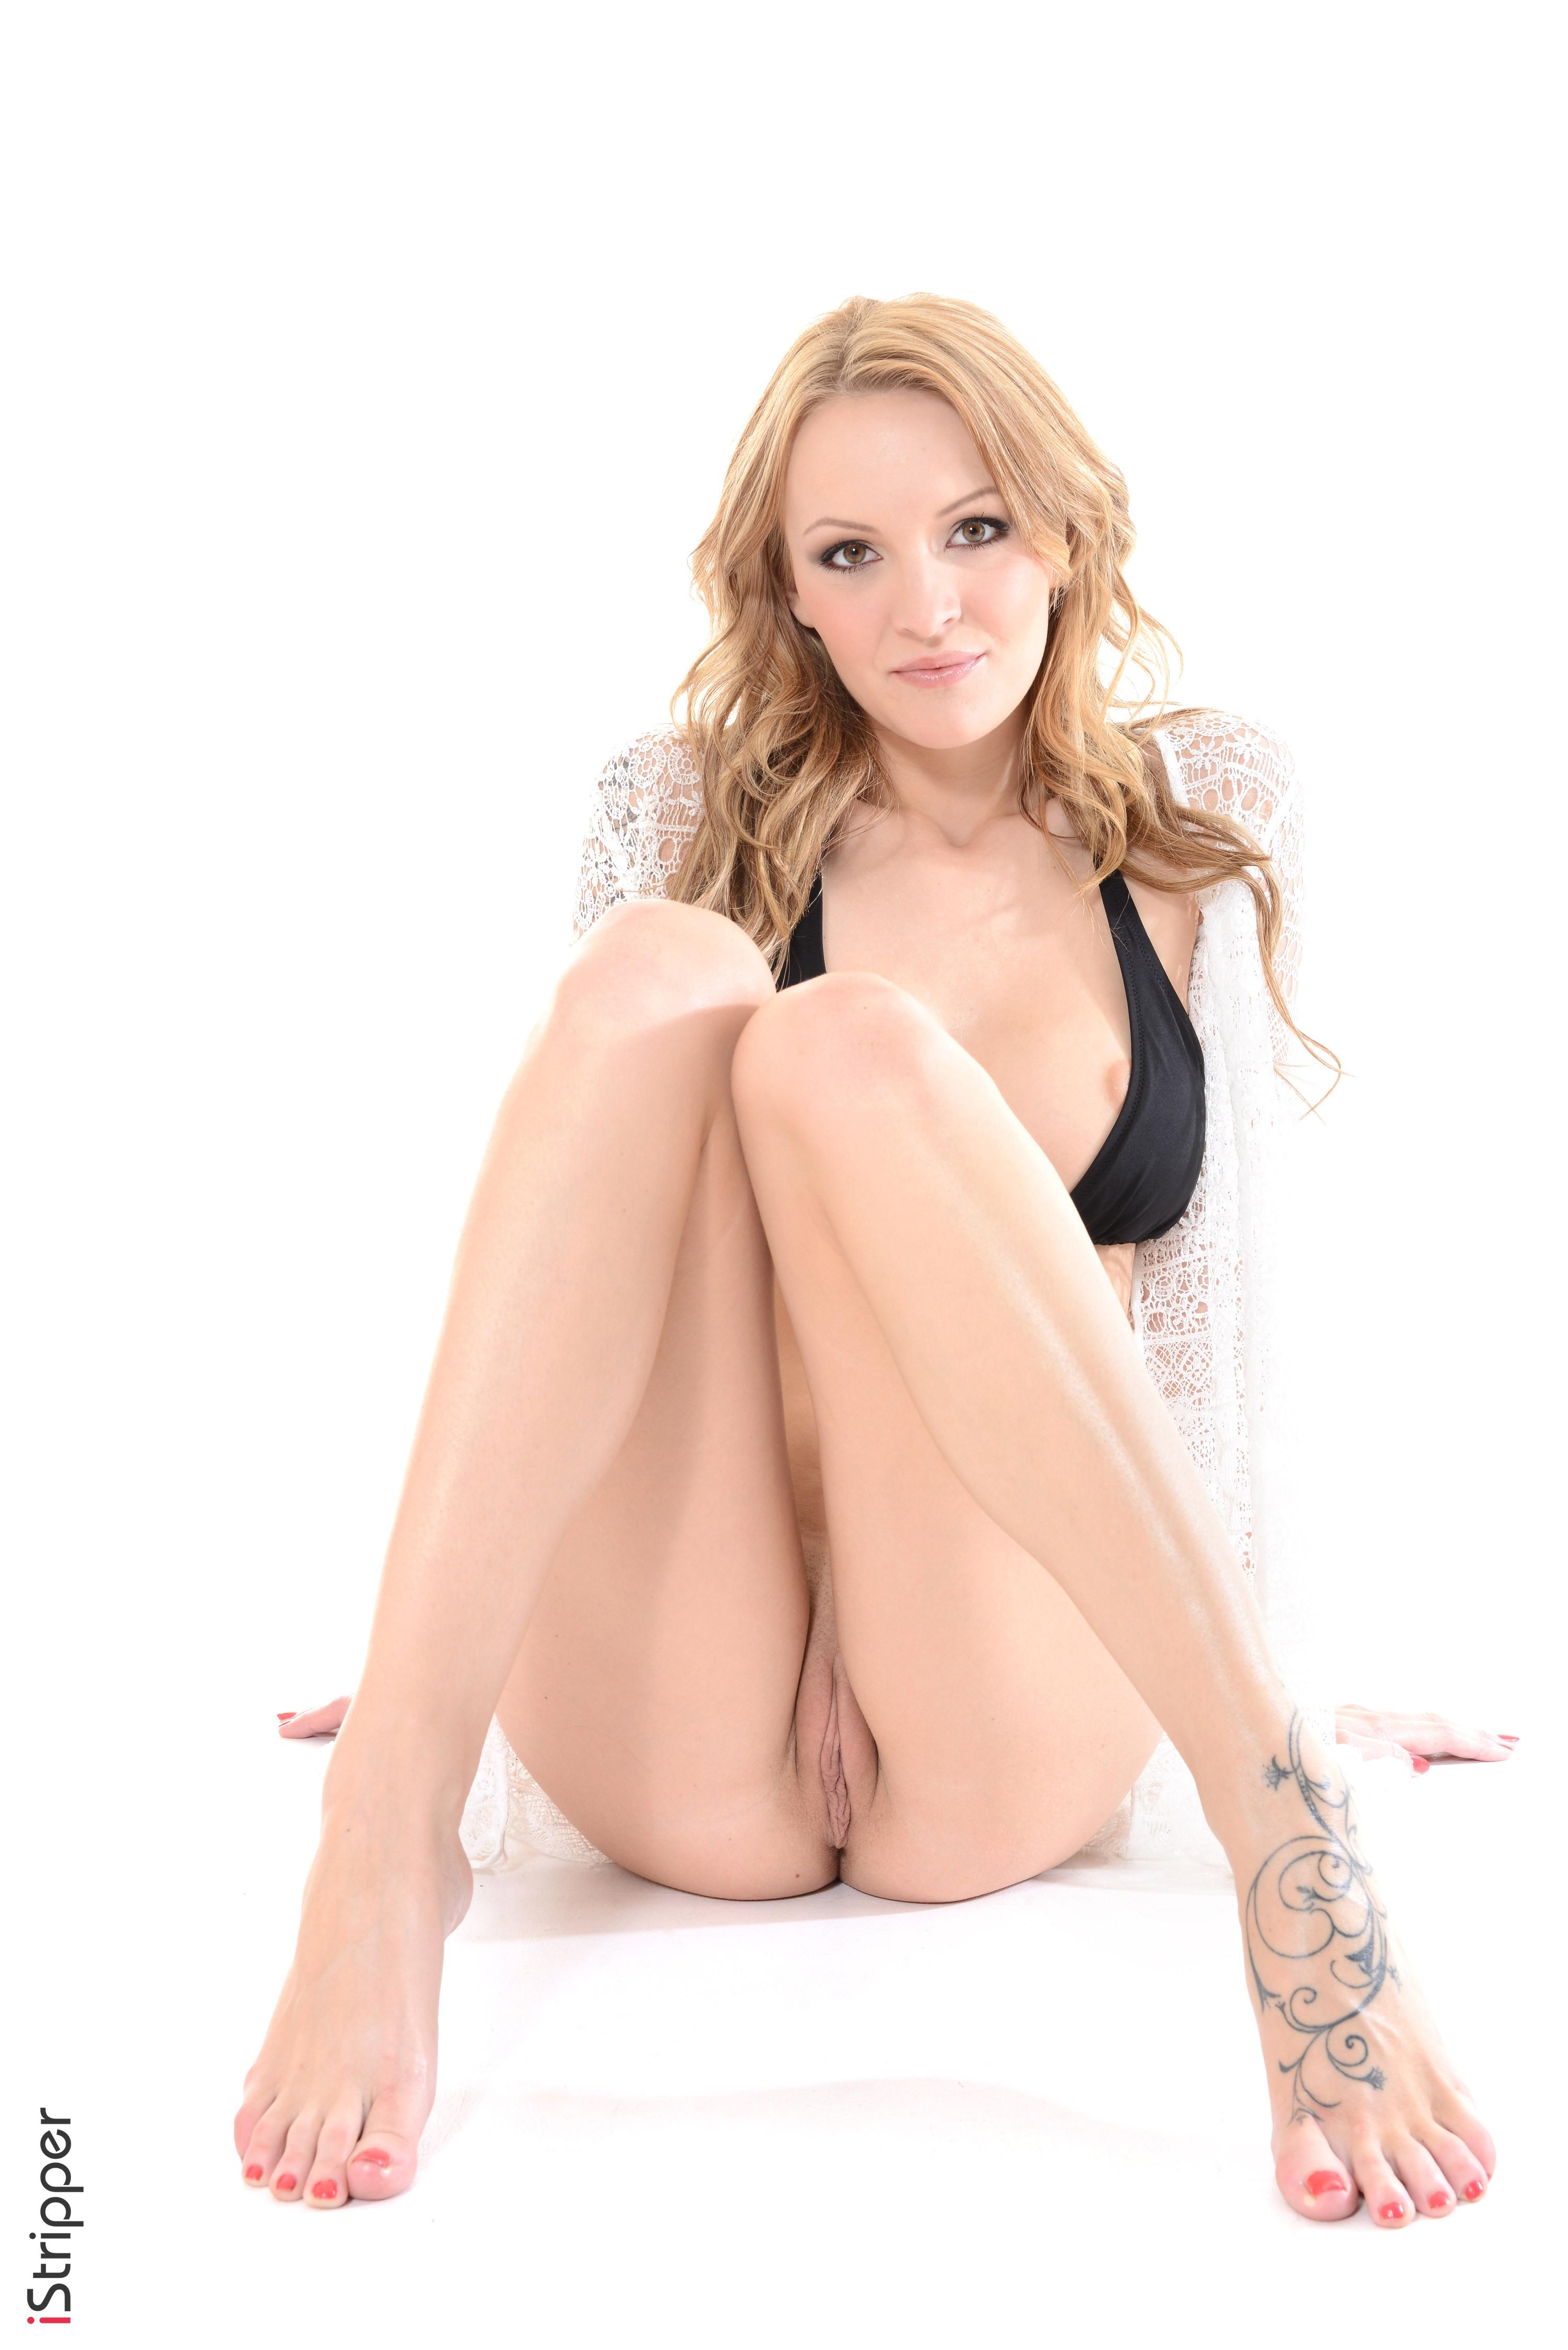 girls stripping uncensored